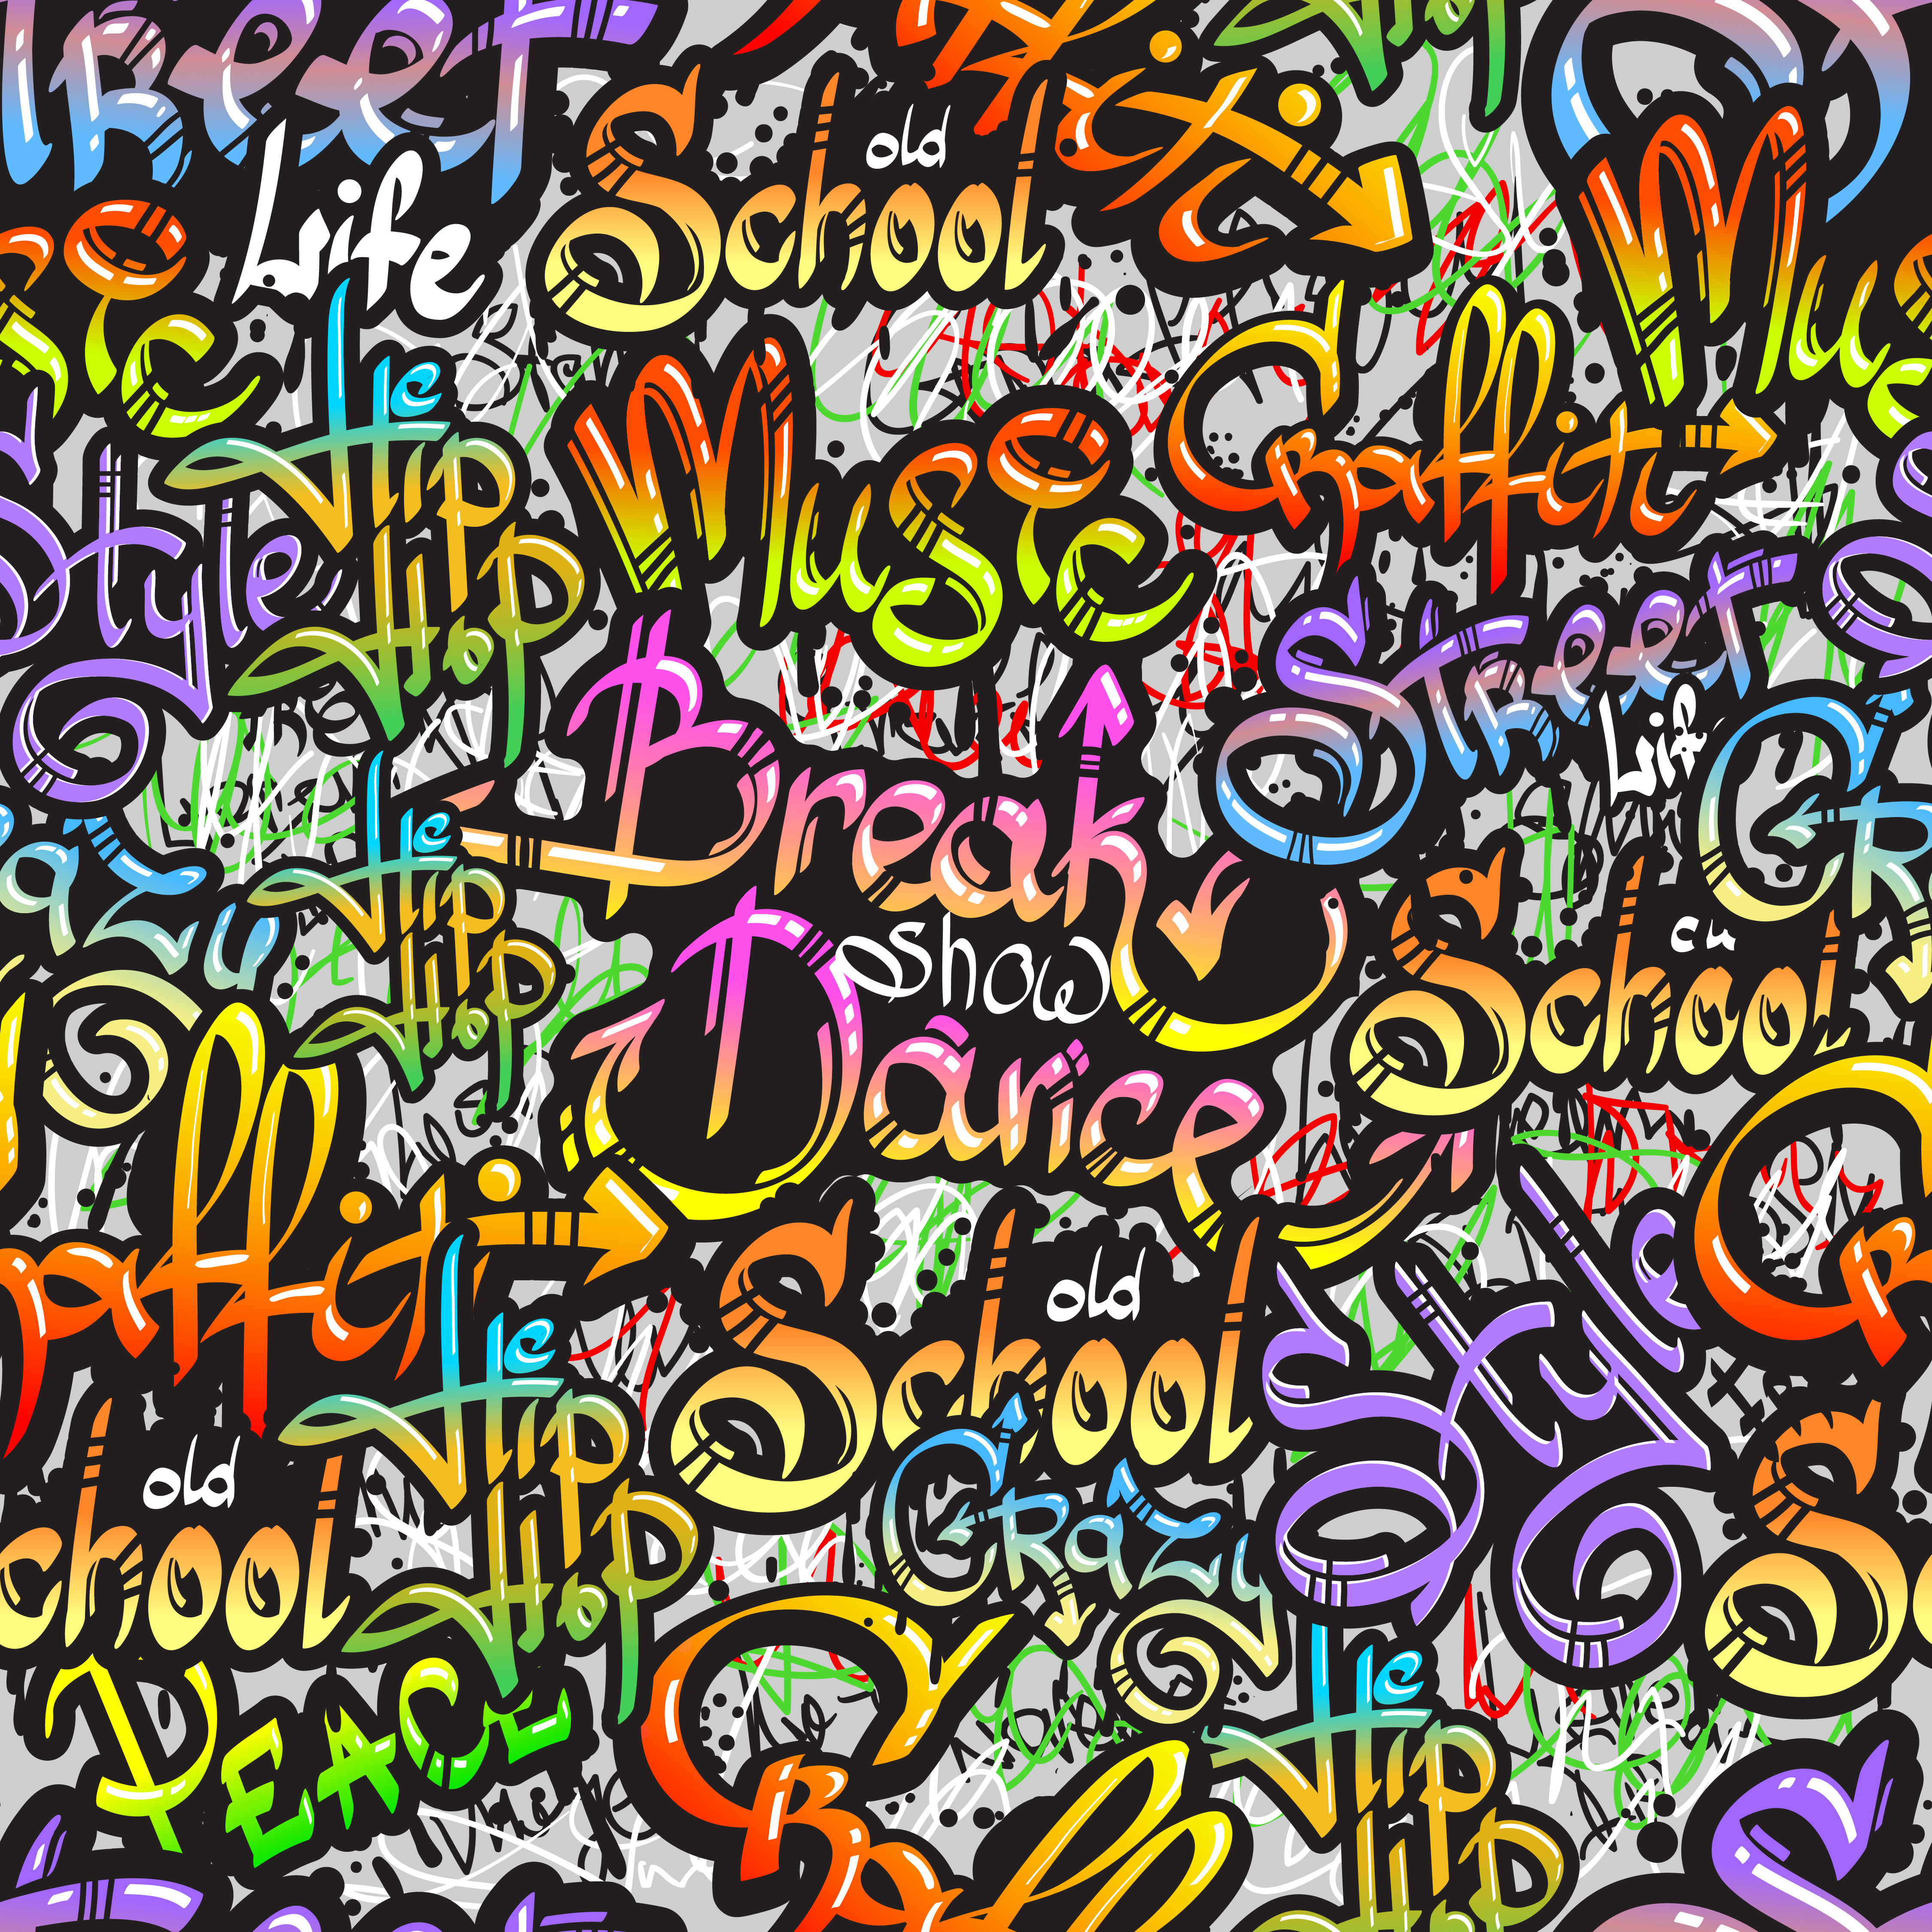 Graffiti word seamless pattern Download Free Vectors Clipart Graphics & Vector Art